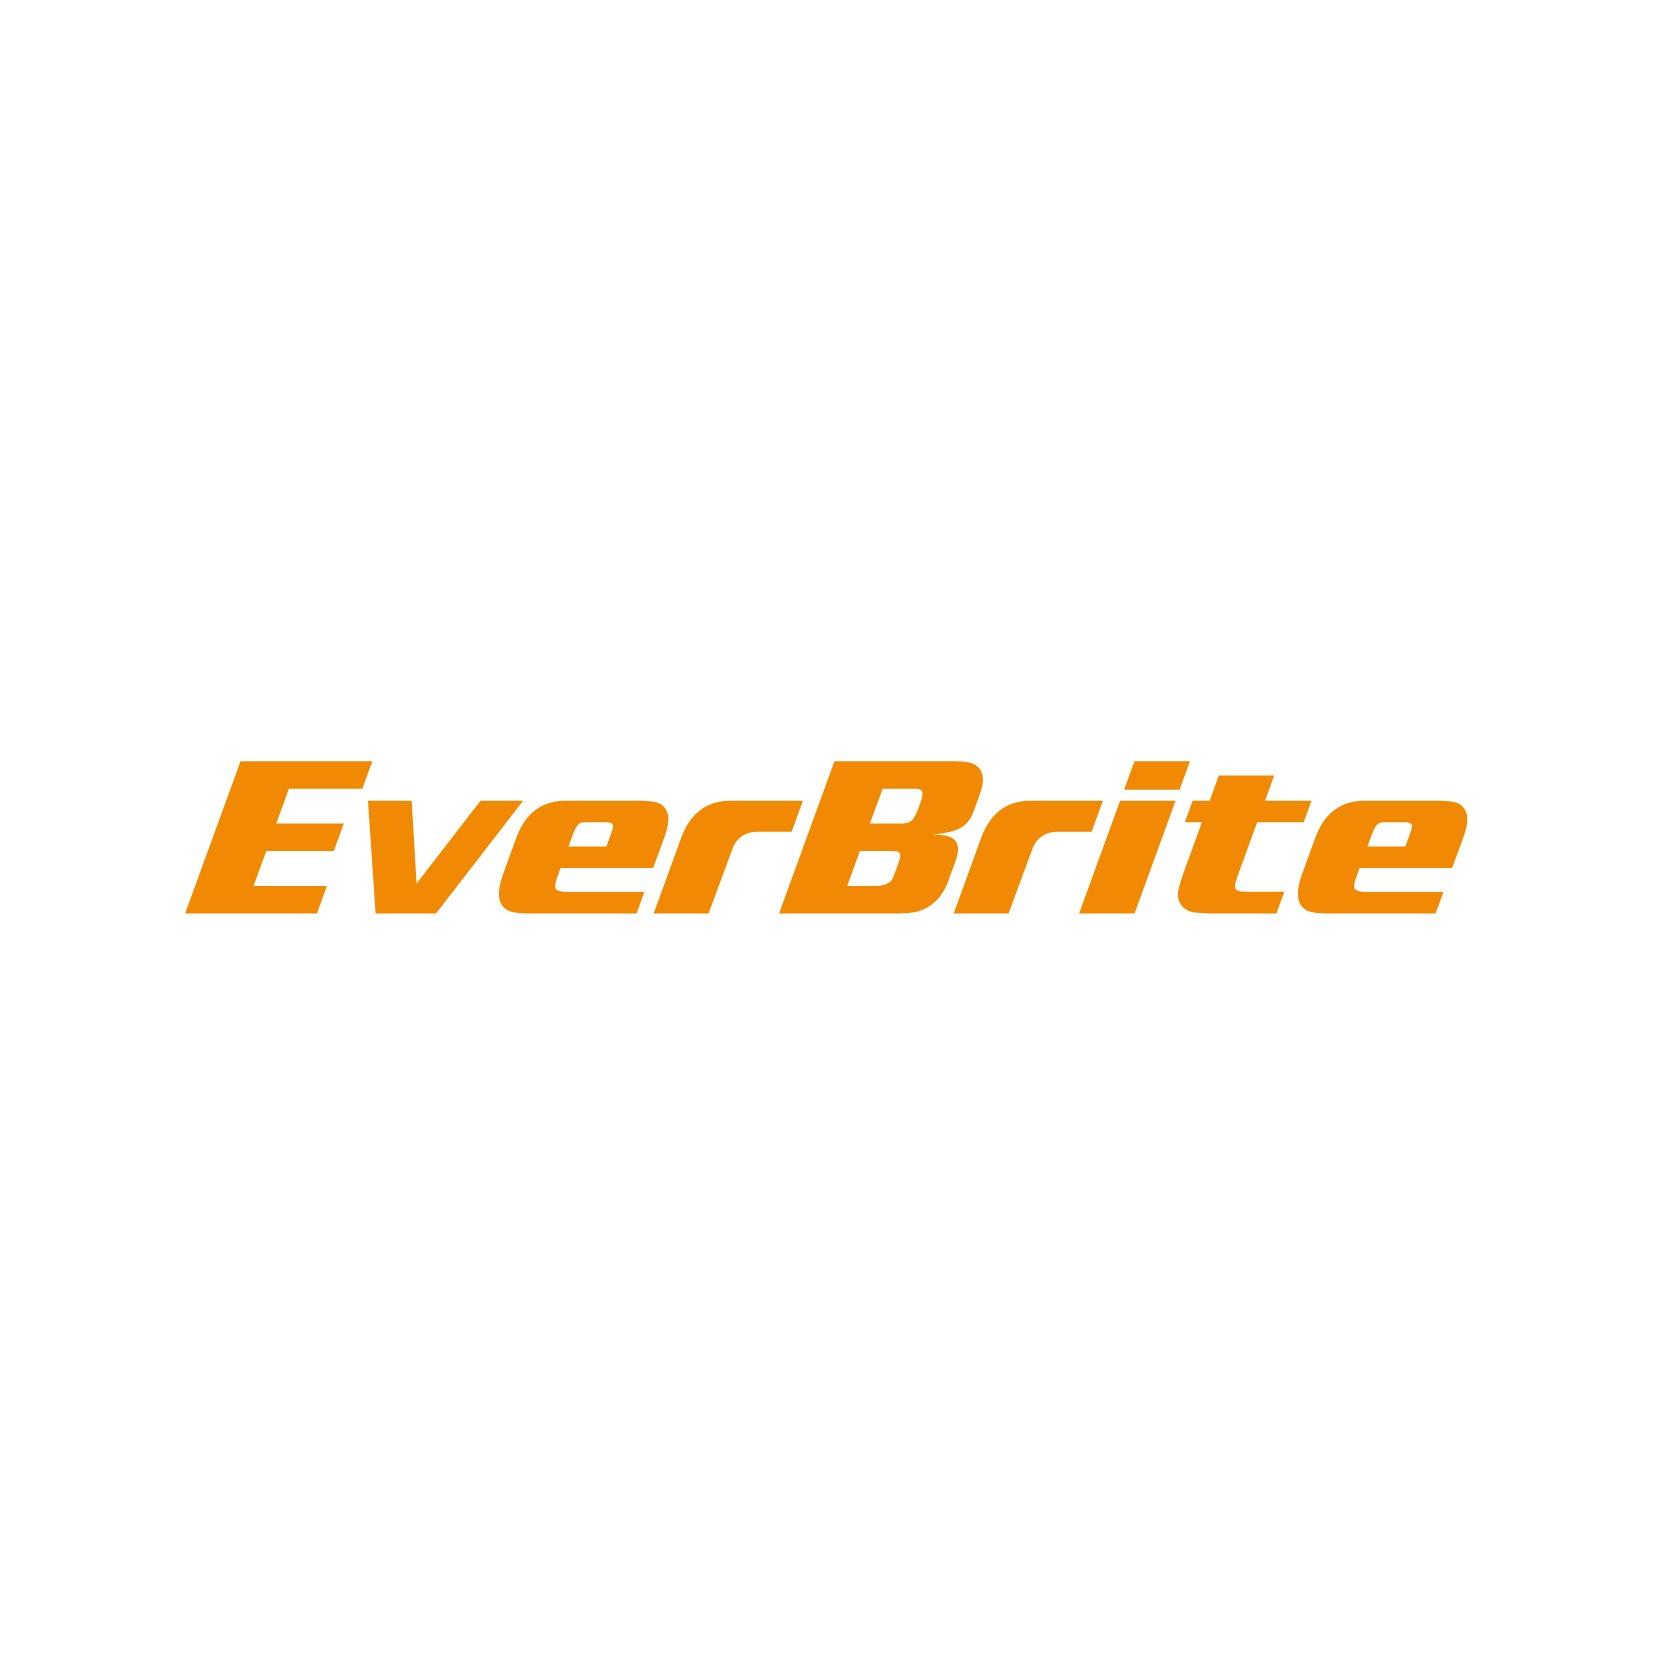 EverBrite